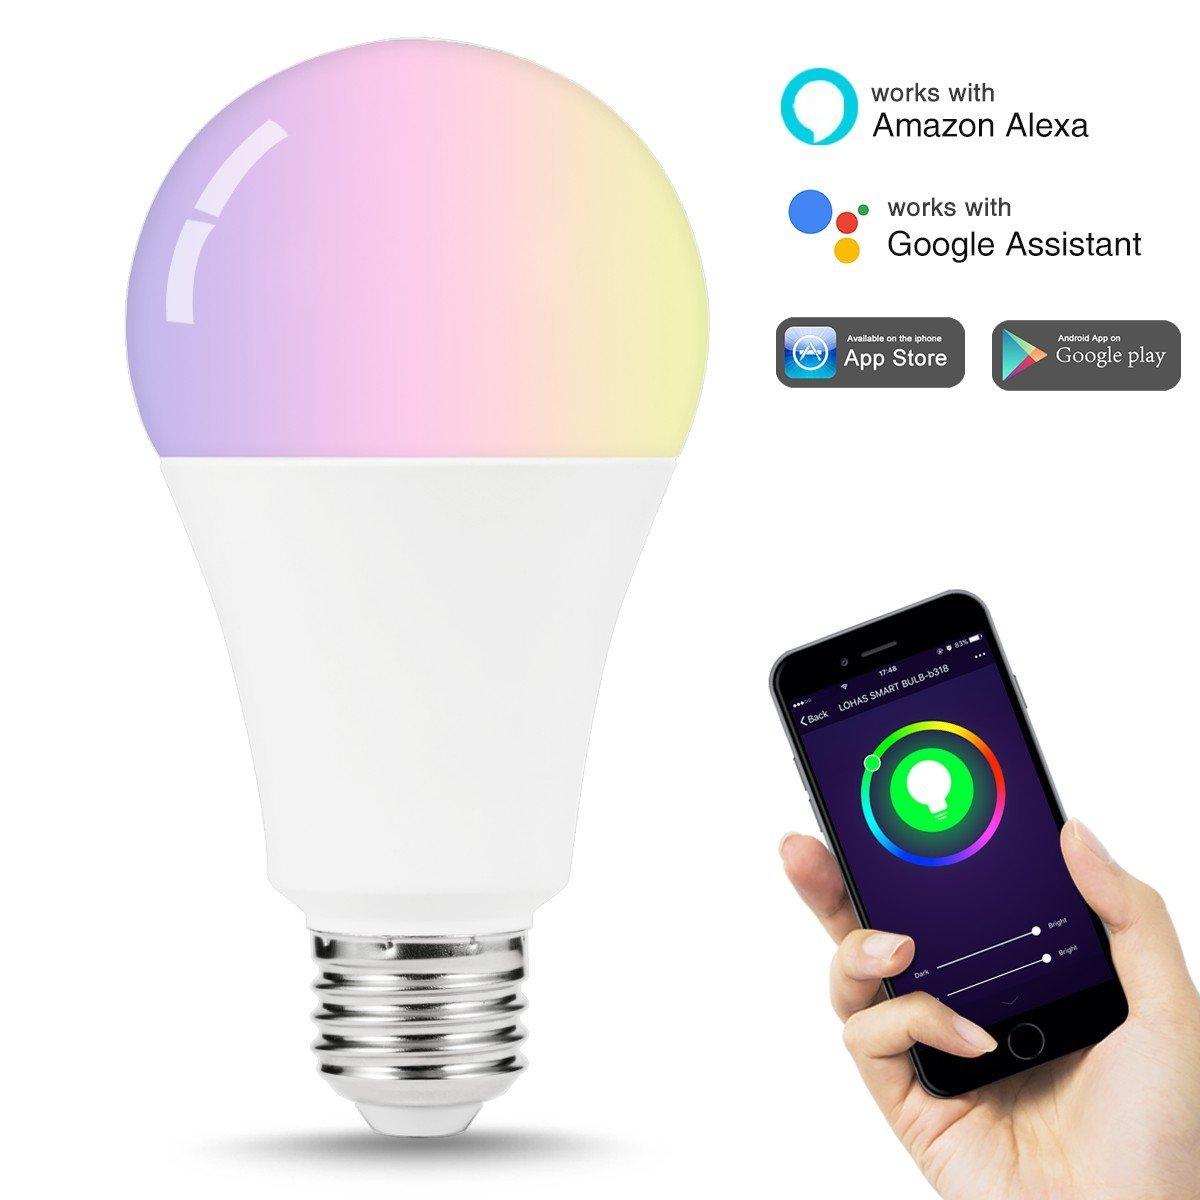 iPerGo: arrivano le lampadine smart intelligenti thumbnail